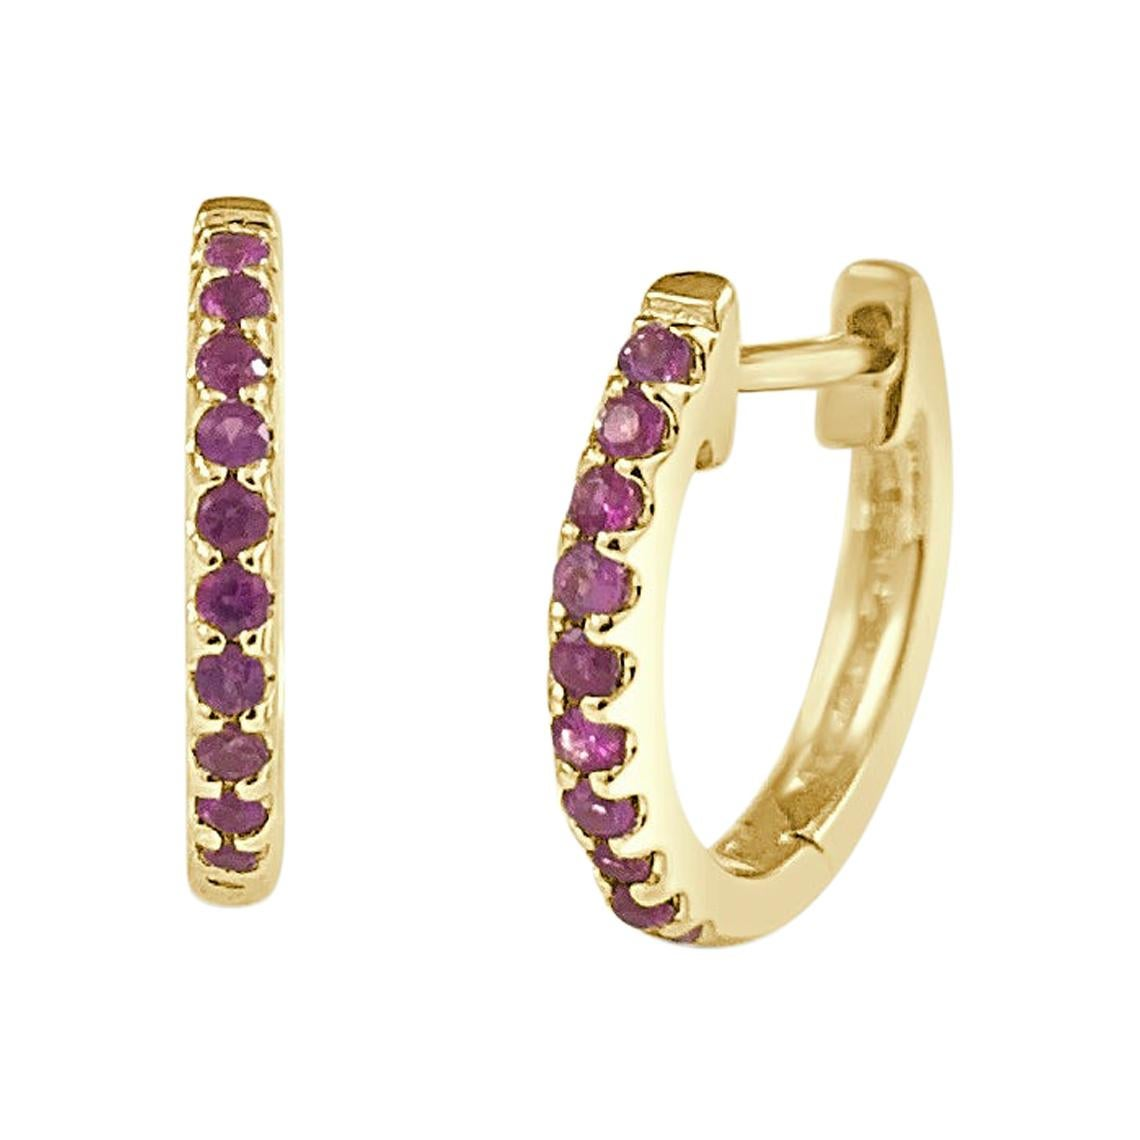 14K Yellow Gold 0.18 Carat Red Ruby Huggie Earrings